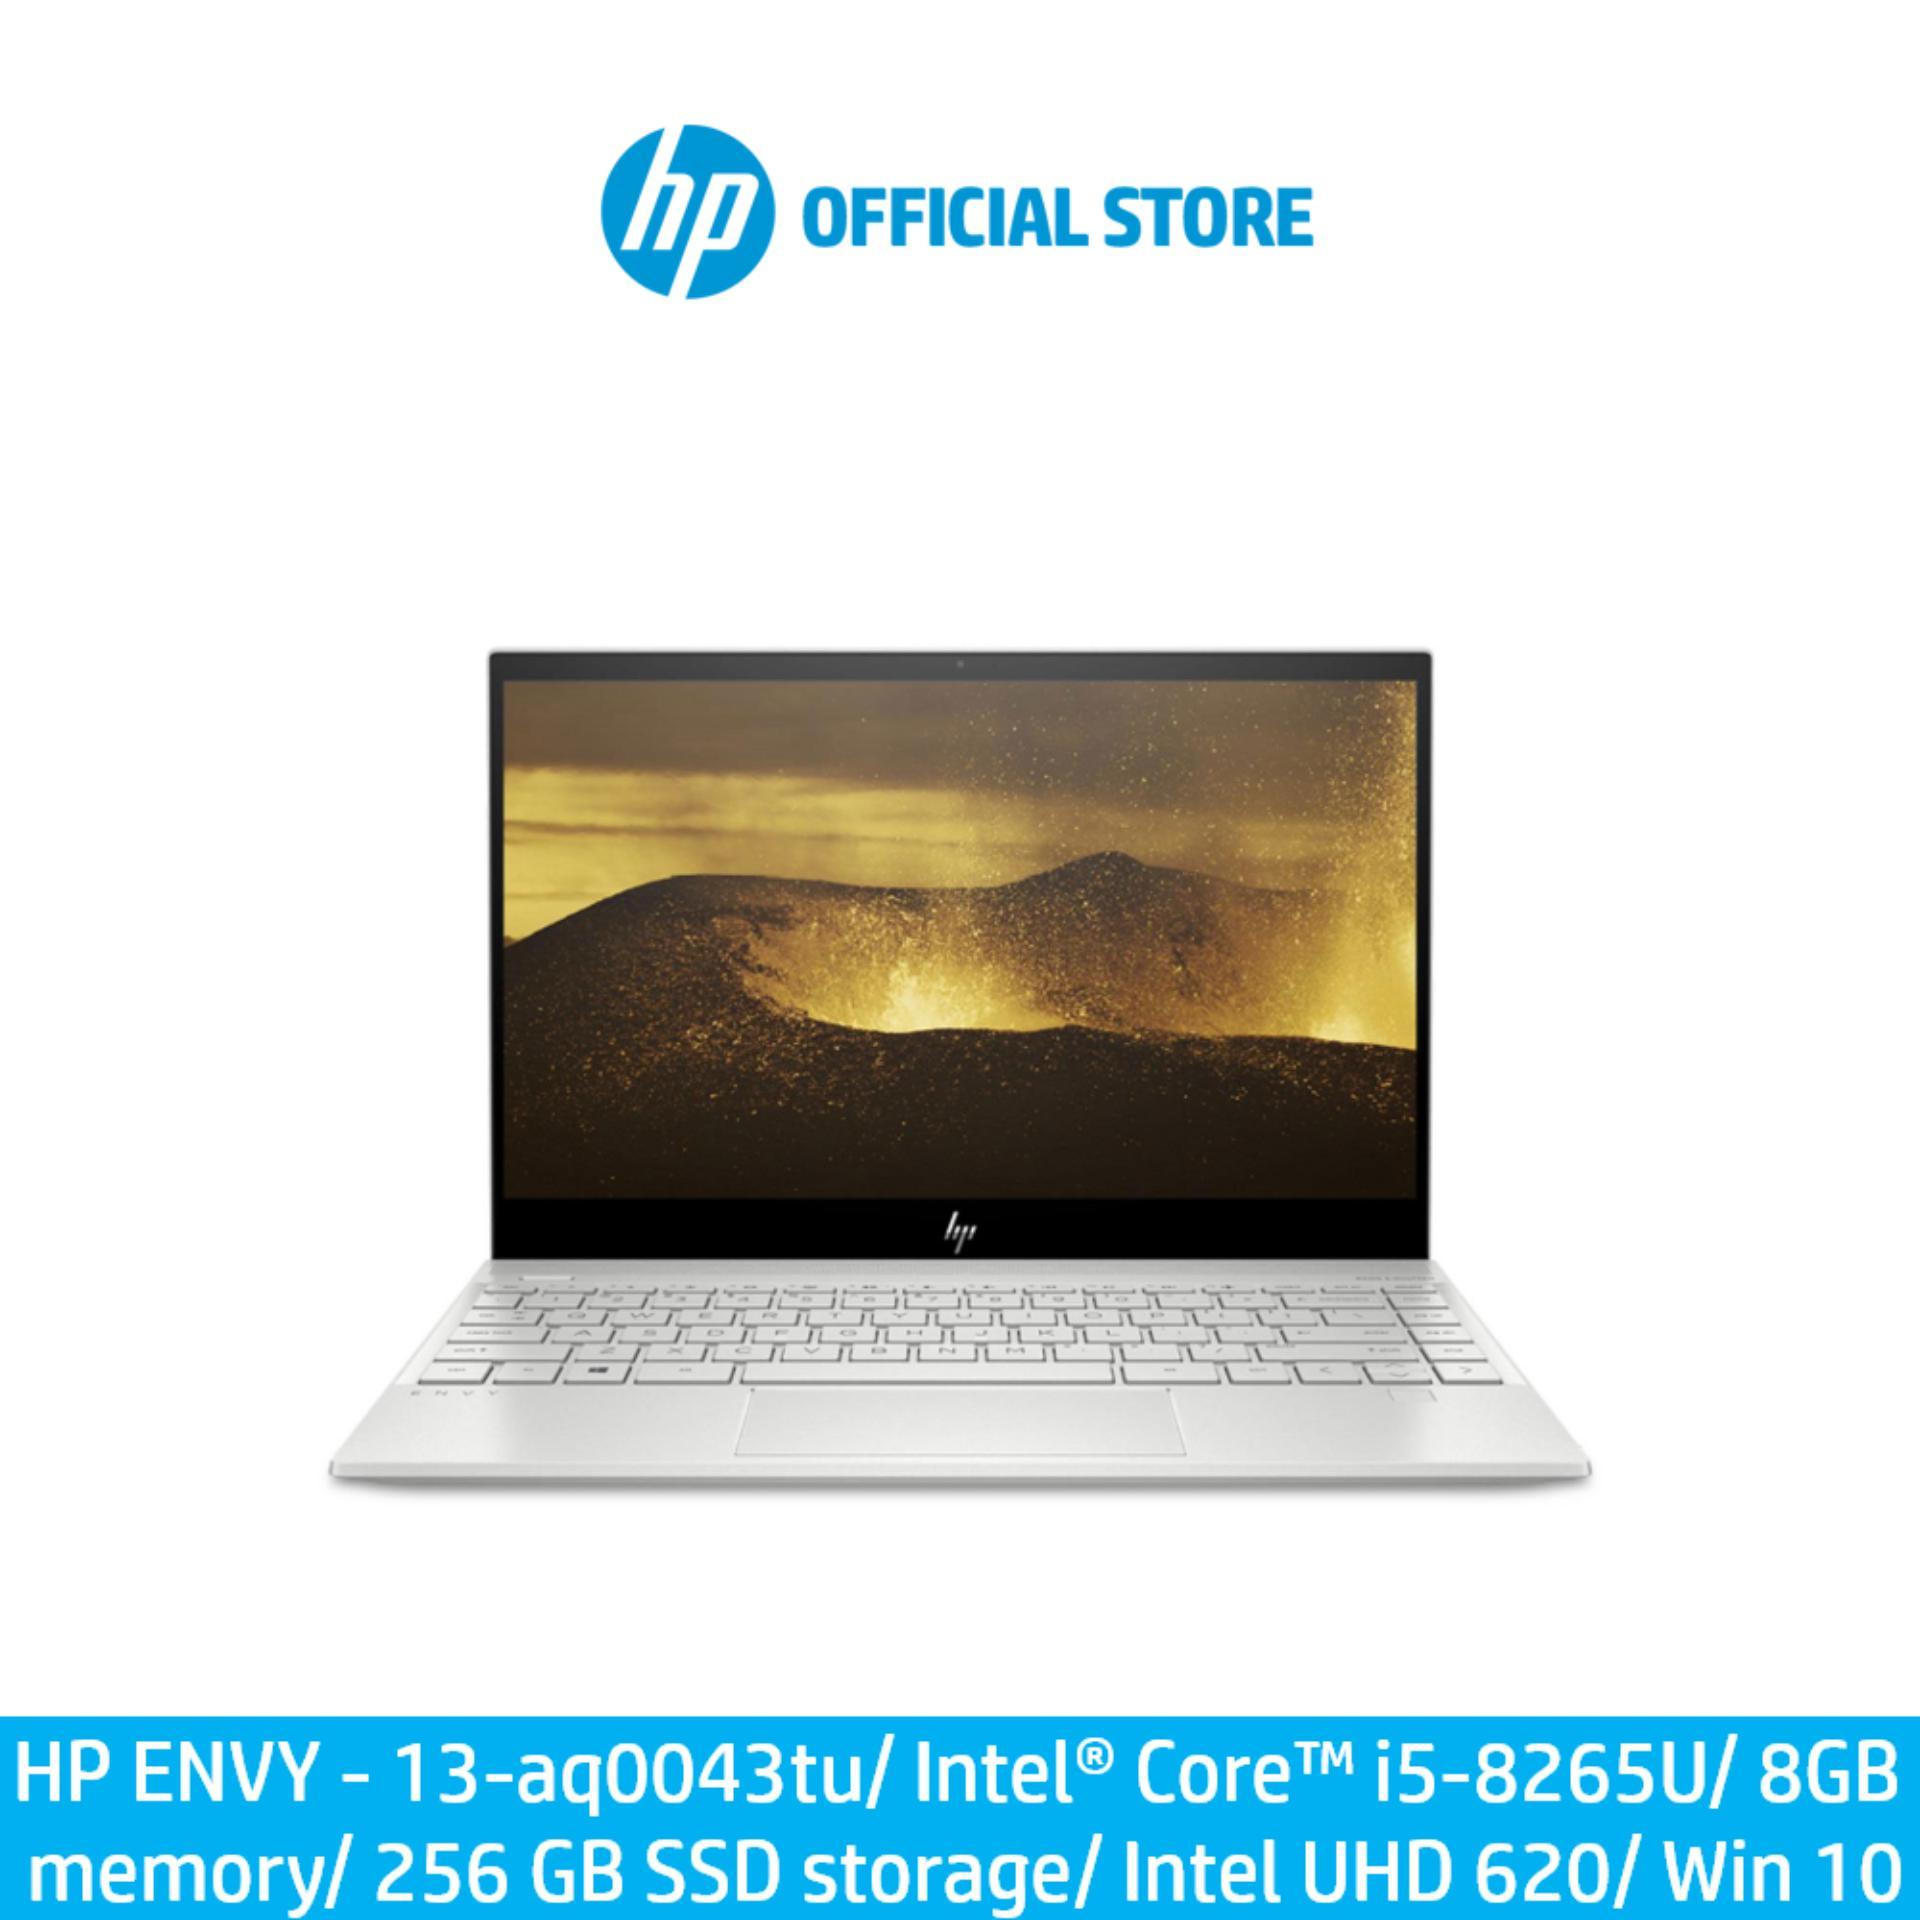 HP ENVY - 13-aq0043tu/ Intel® Core™ i5-8265U/  8 GB memory/ 256 GB SSD storage/ Intel UHD 620/ Win 10